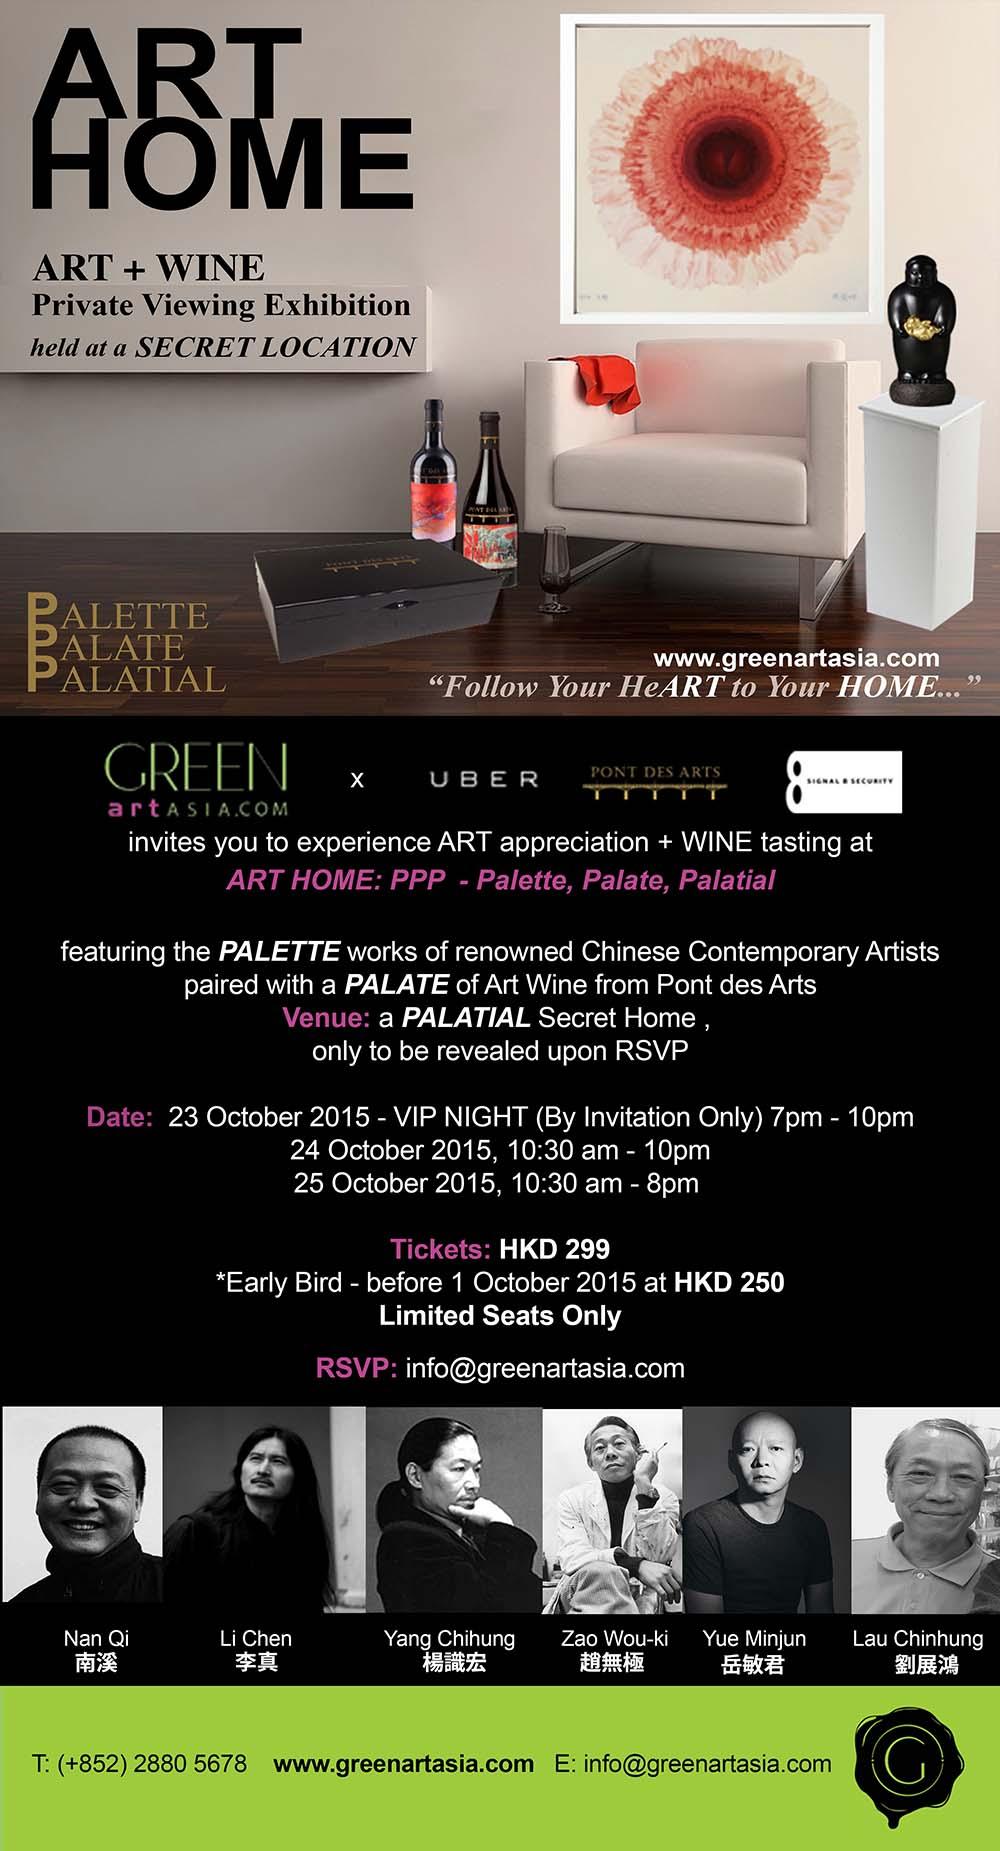 INVITATION - ART HOME PPP